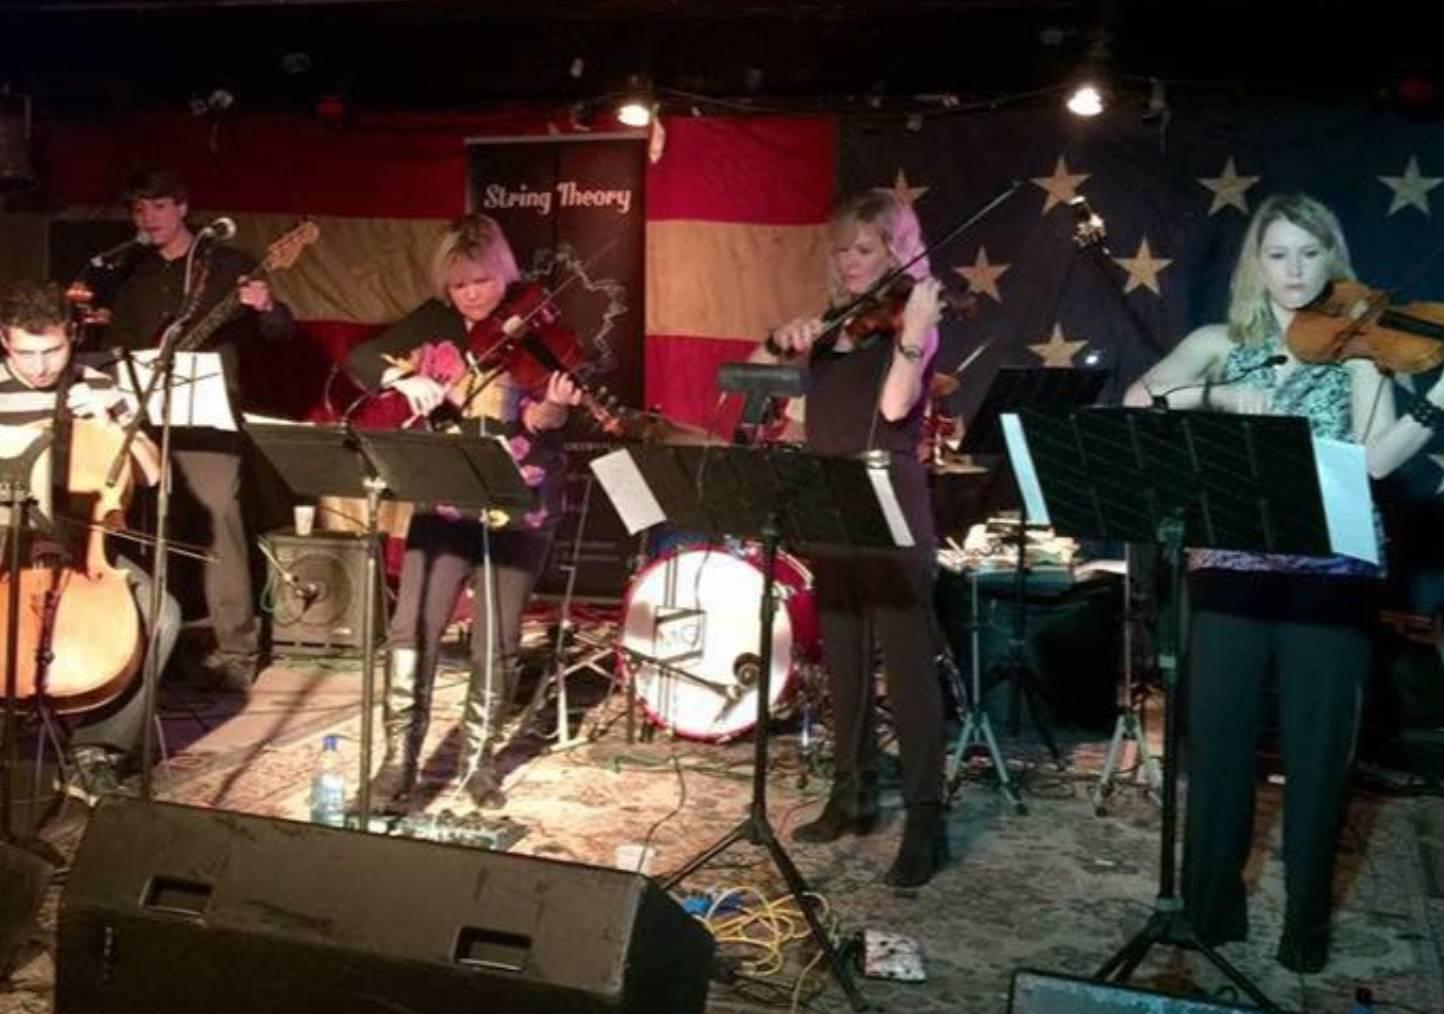 Live Music w/ String Theory Birmingham